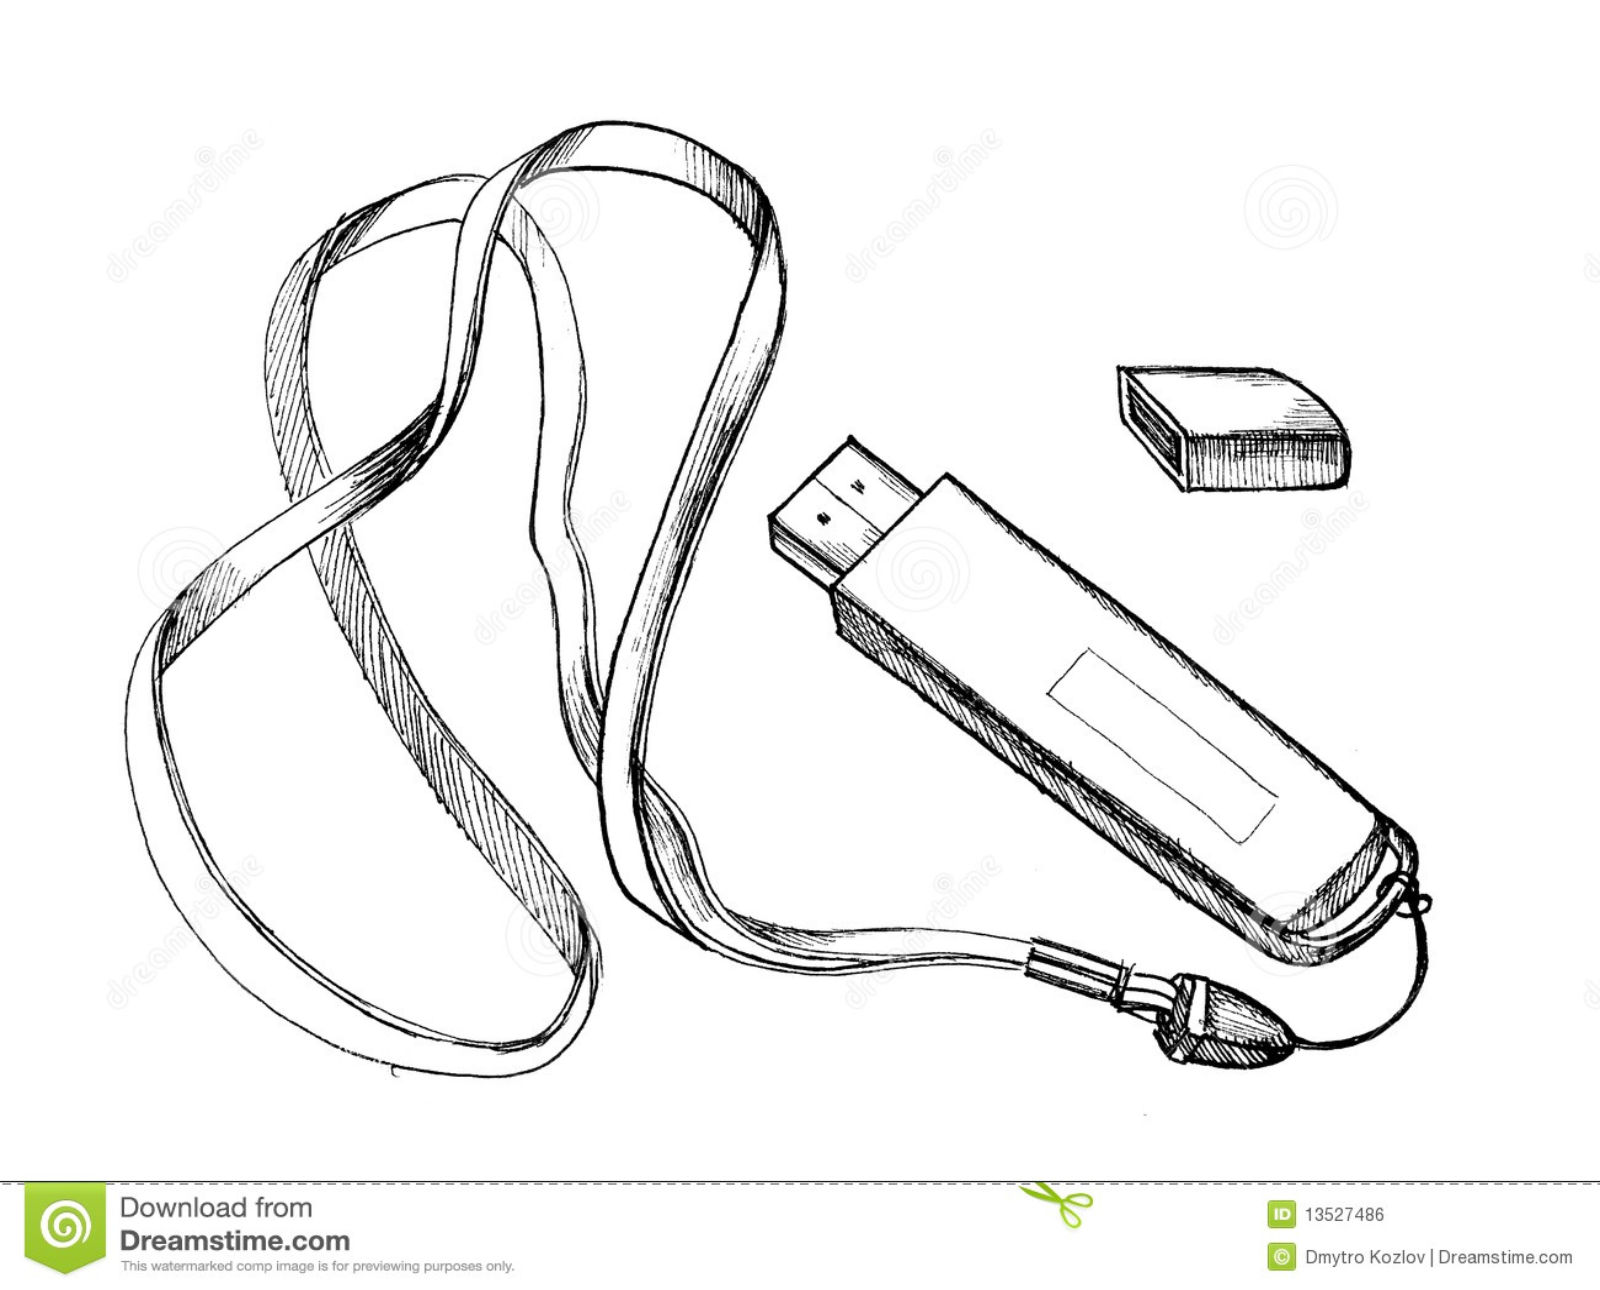 Flash drive stock illustration. Illustration of black